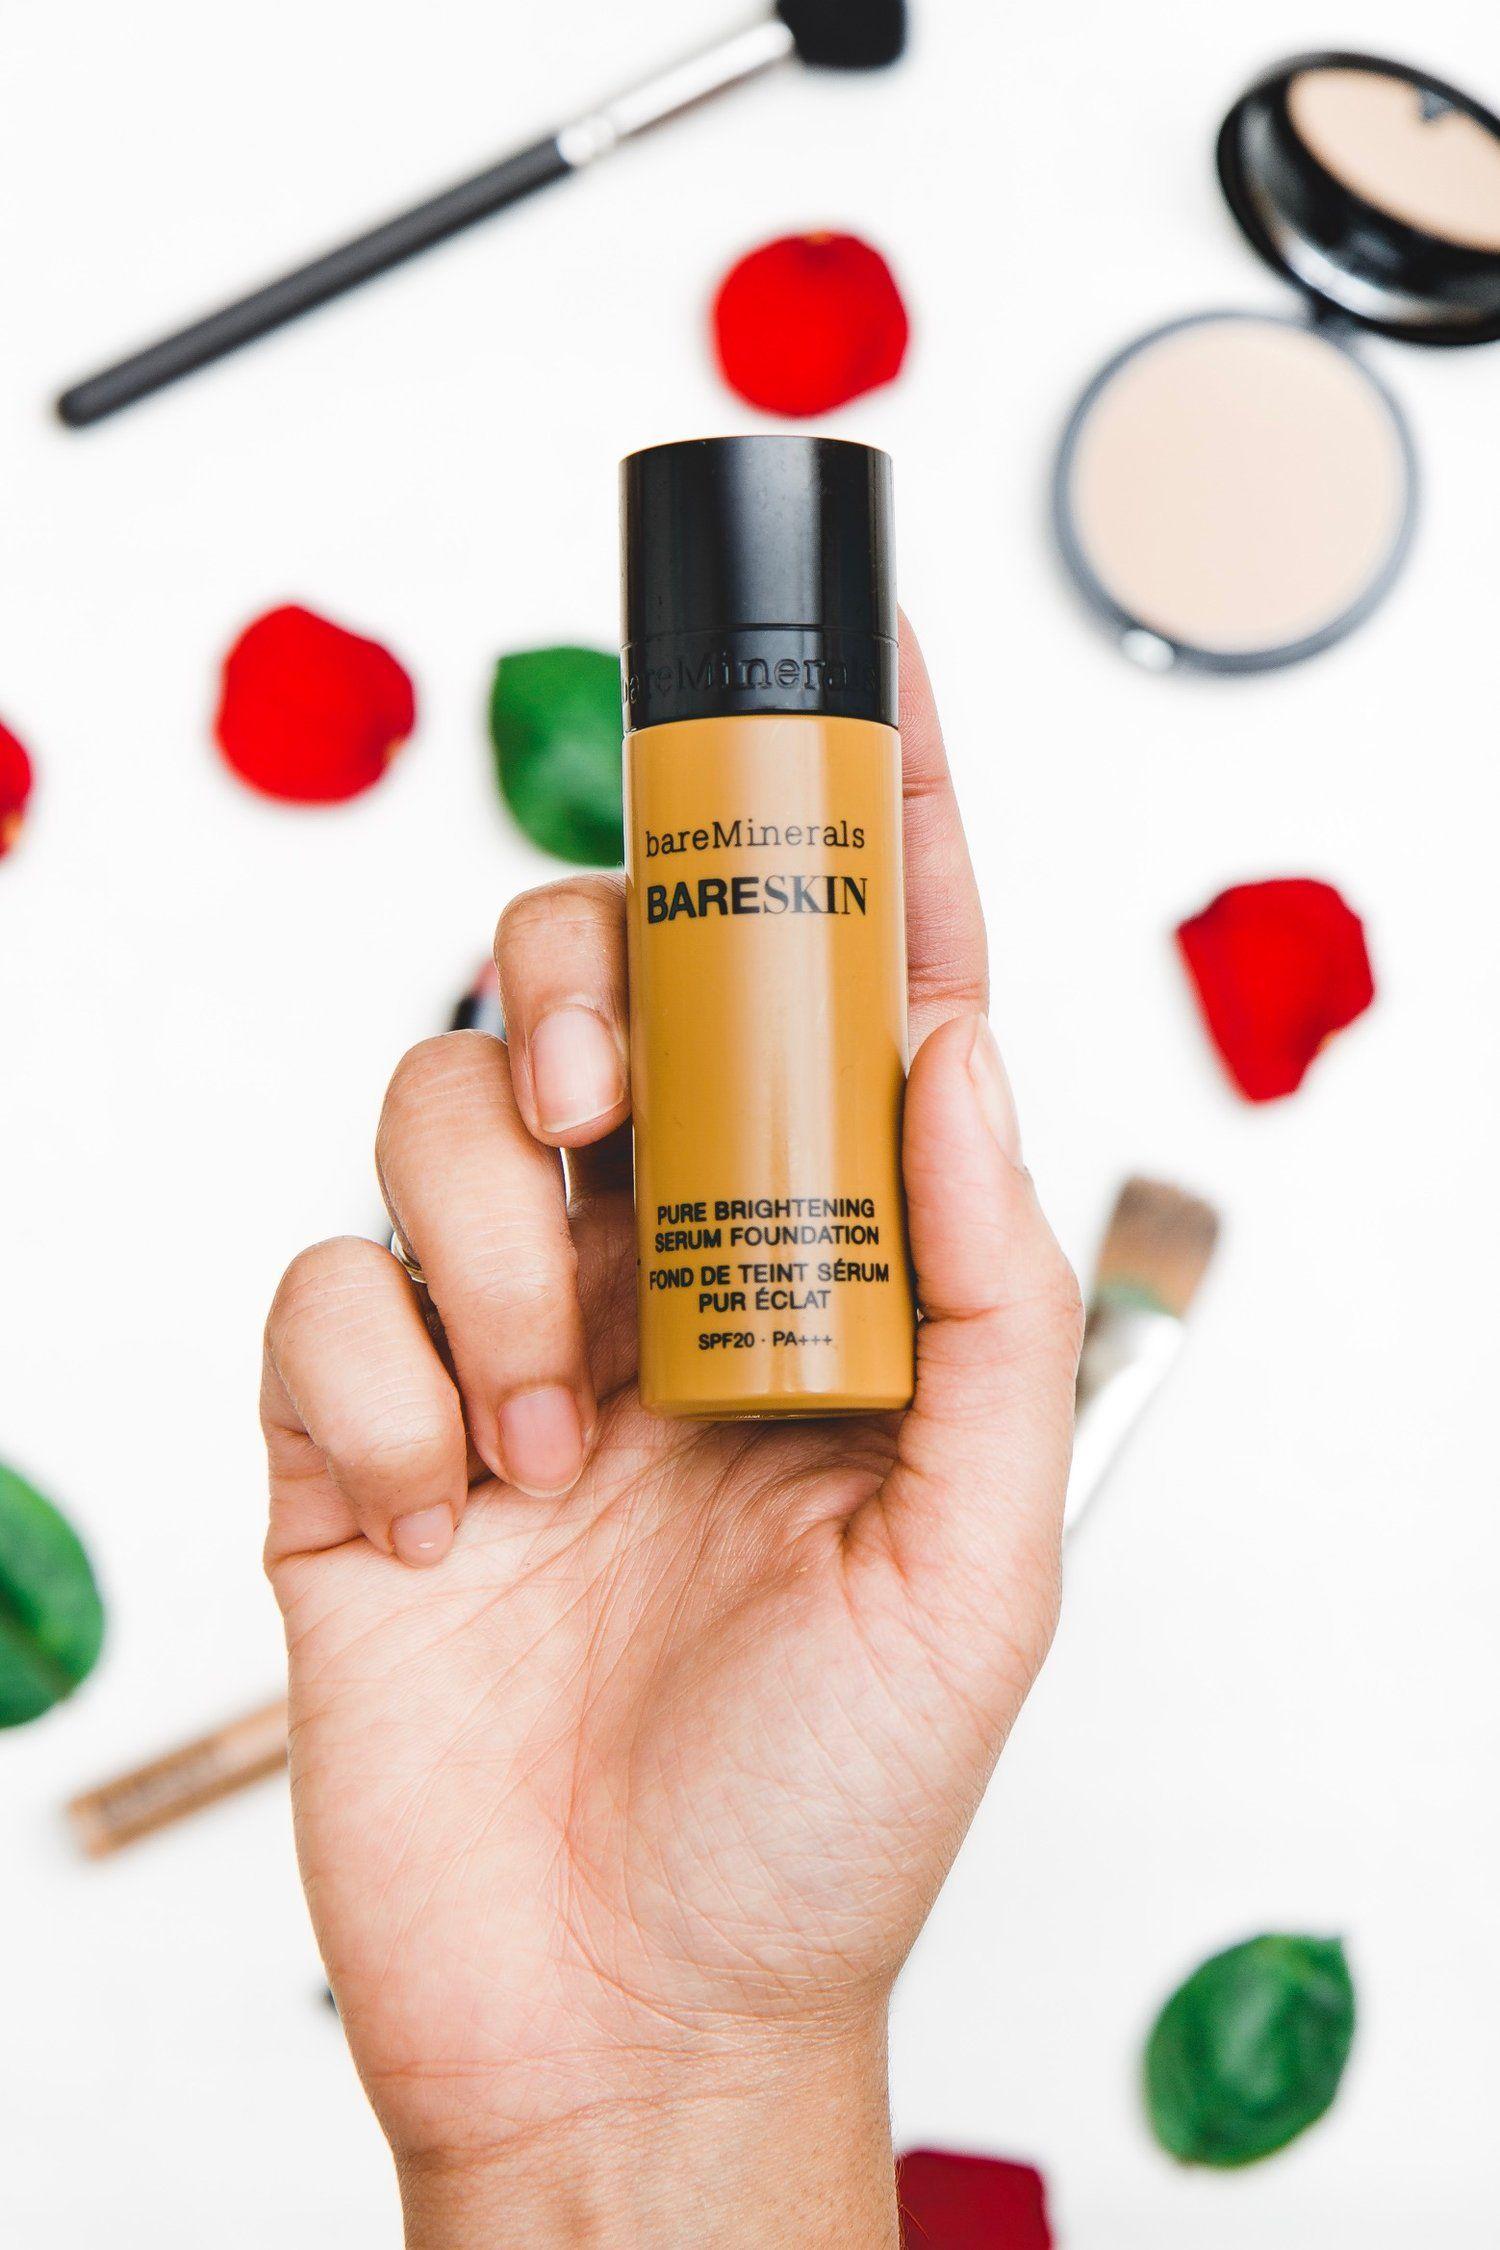 Bare Minerals Makeup Haul Review Bare minerals makeup